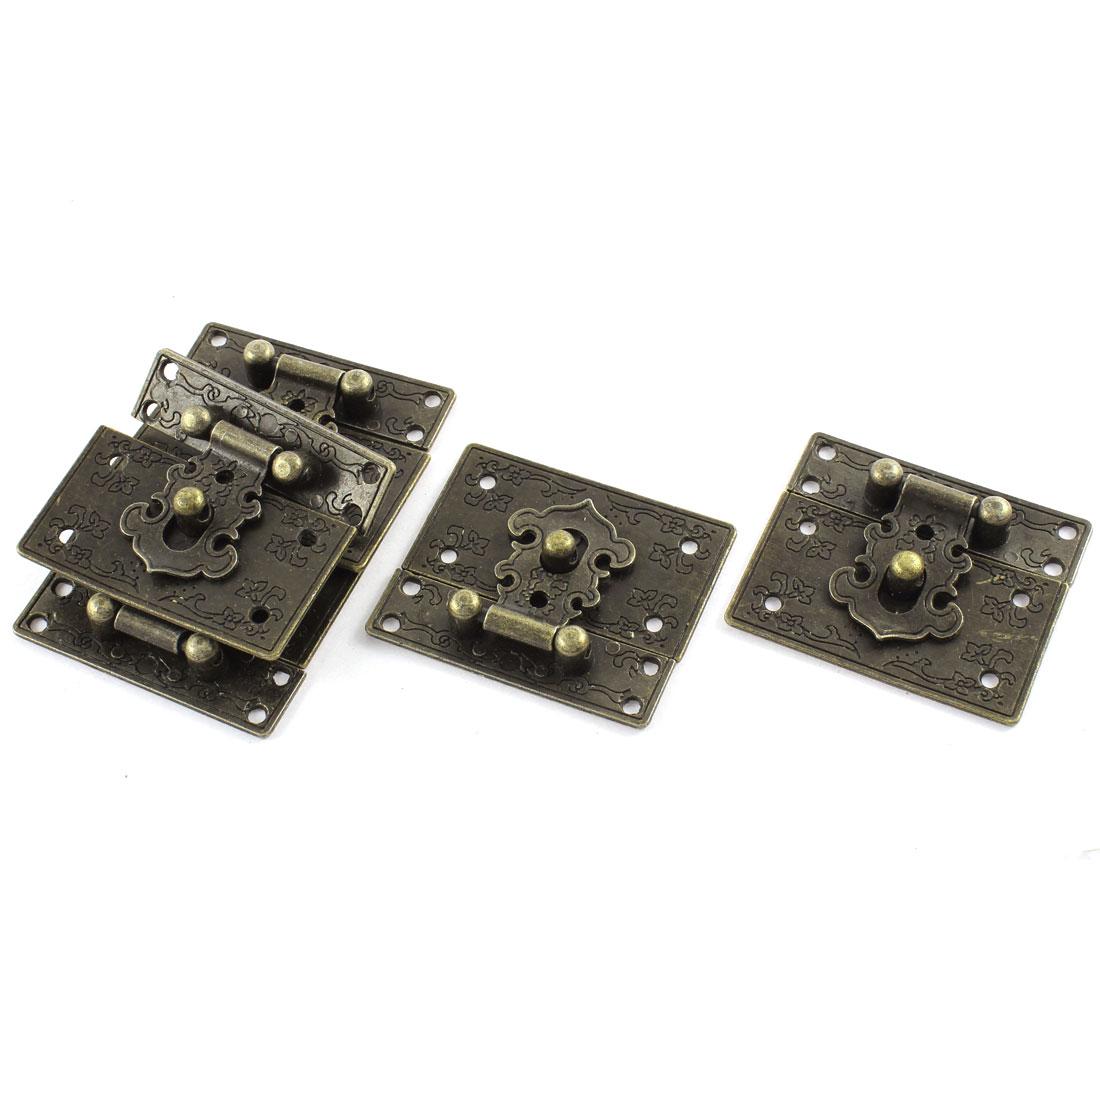 5pcs 55mmx47mm Vintage Style Jewelry Box Hasp Lock Latch w Screws